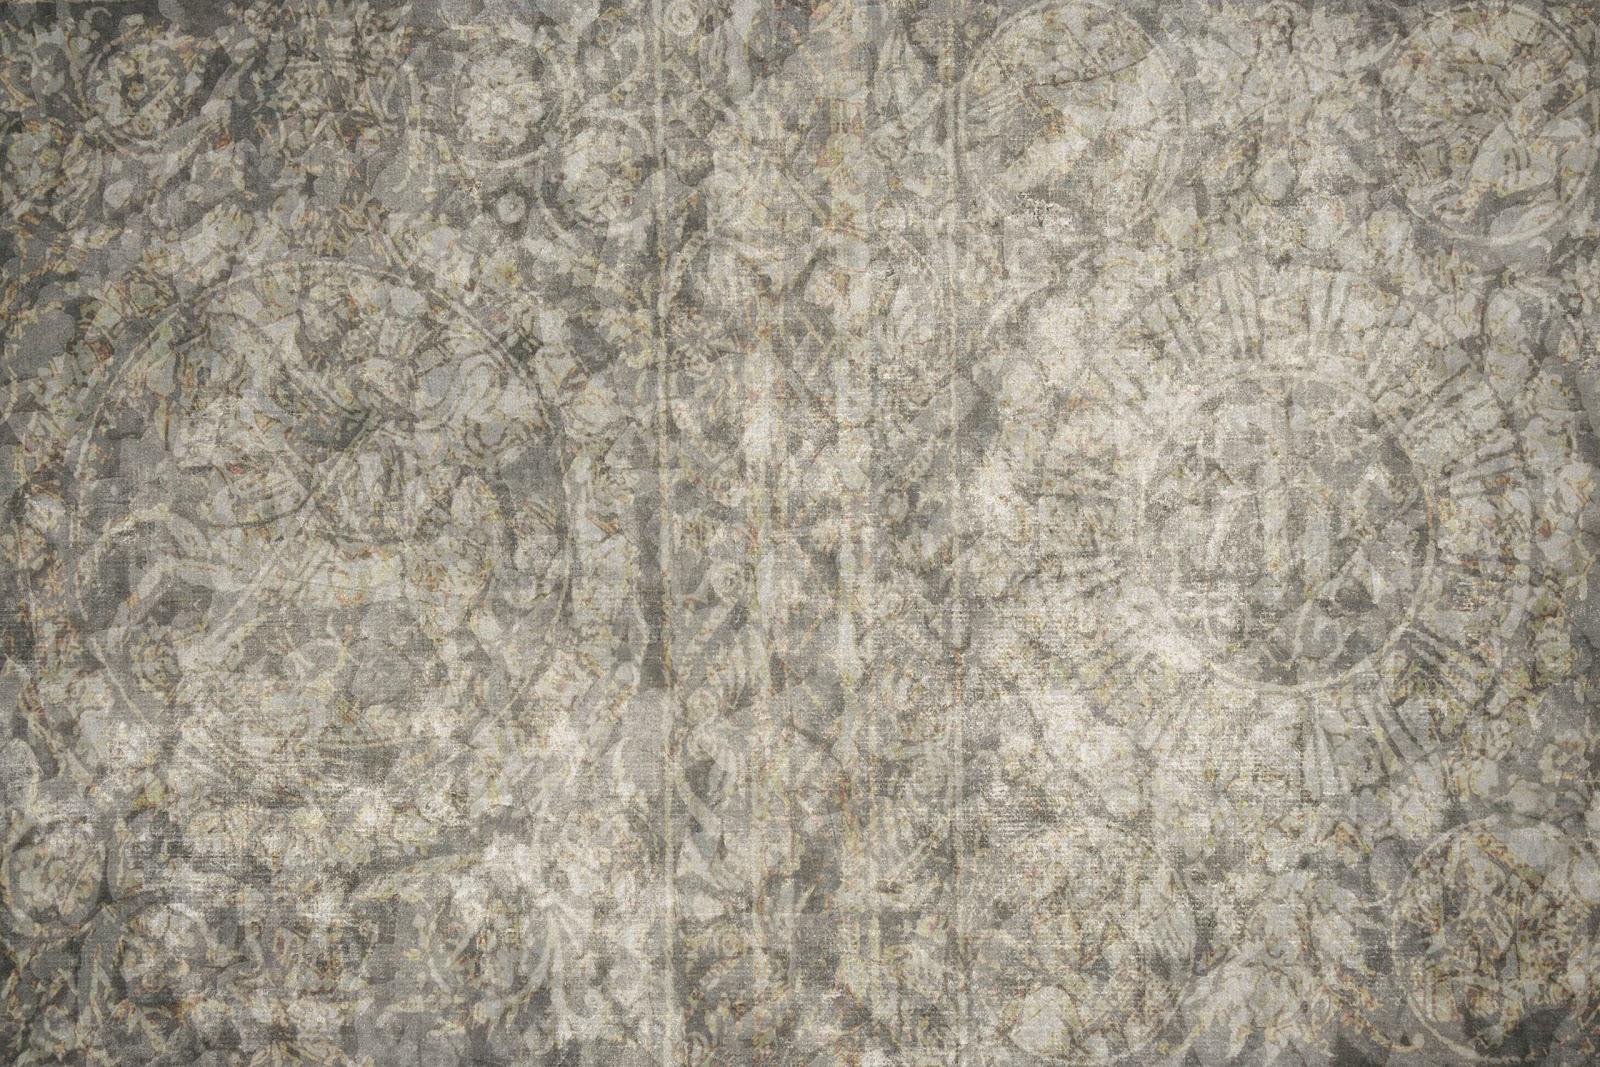 10 Free High Quality Renaissance Textures - ibjennyjenny Photography